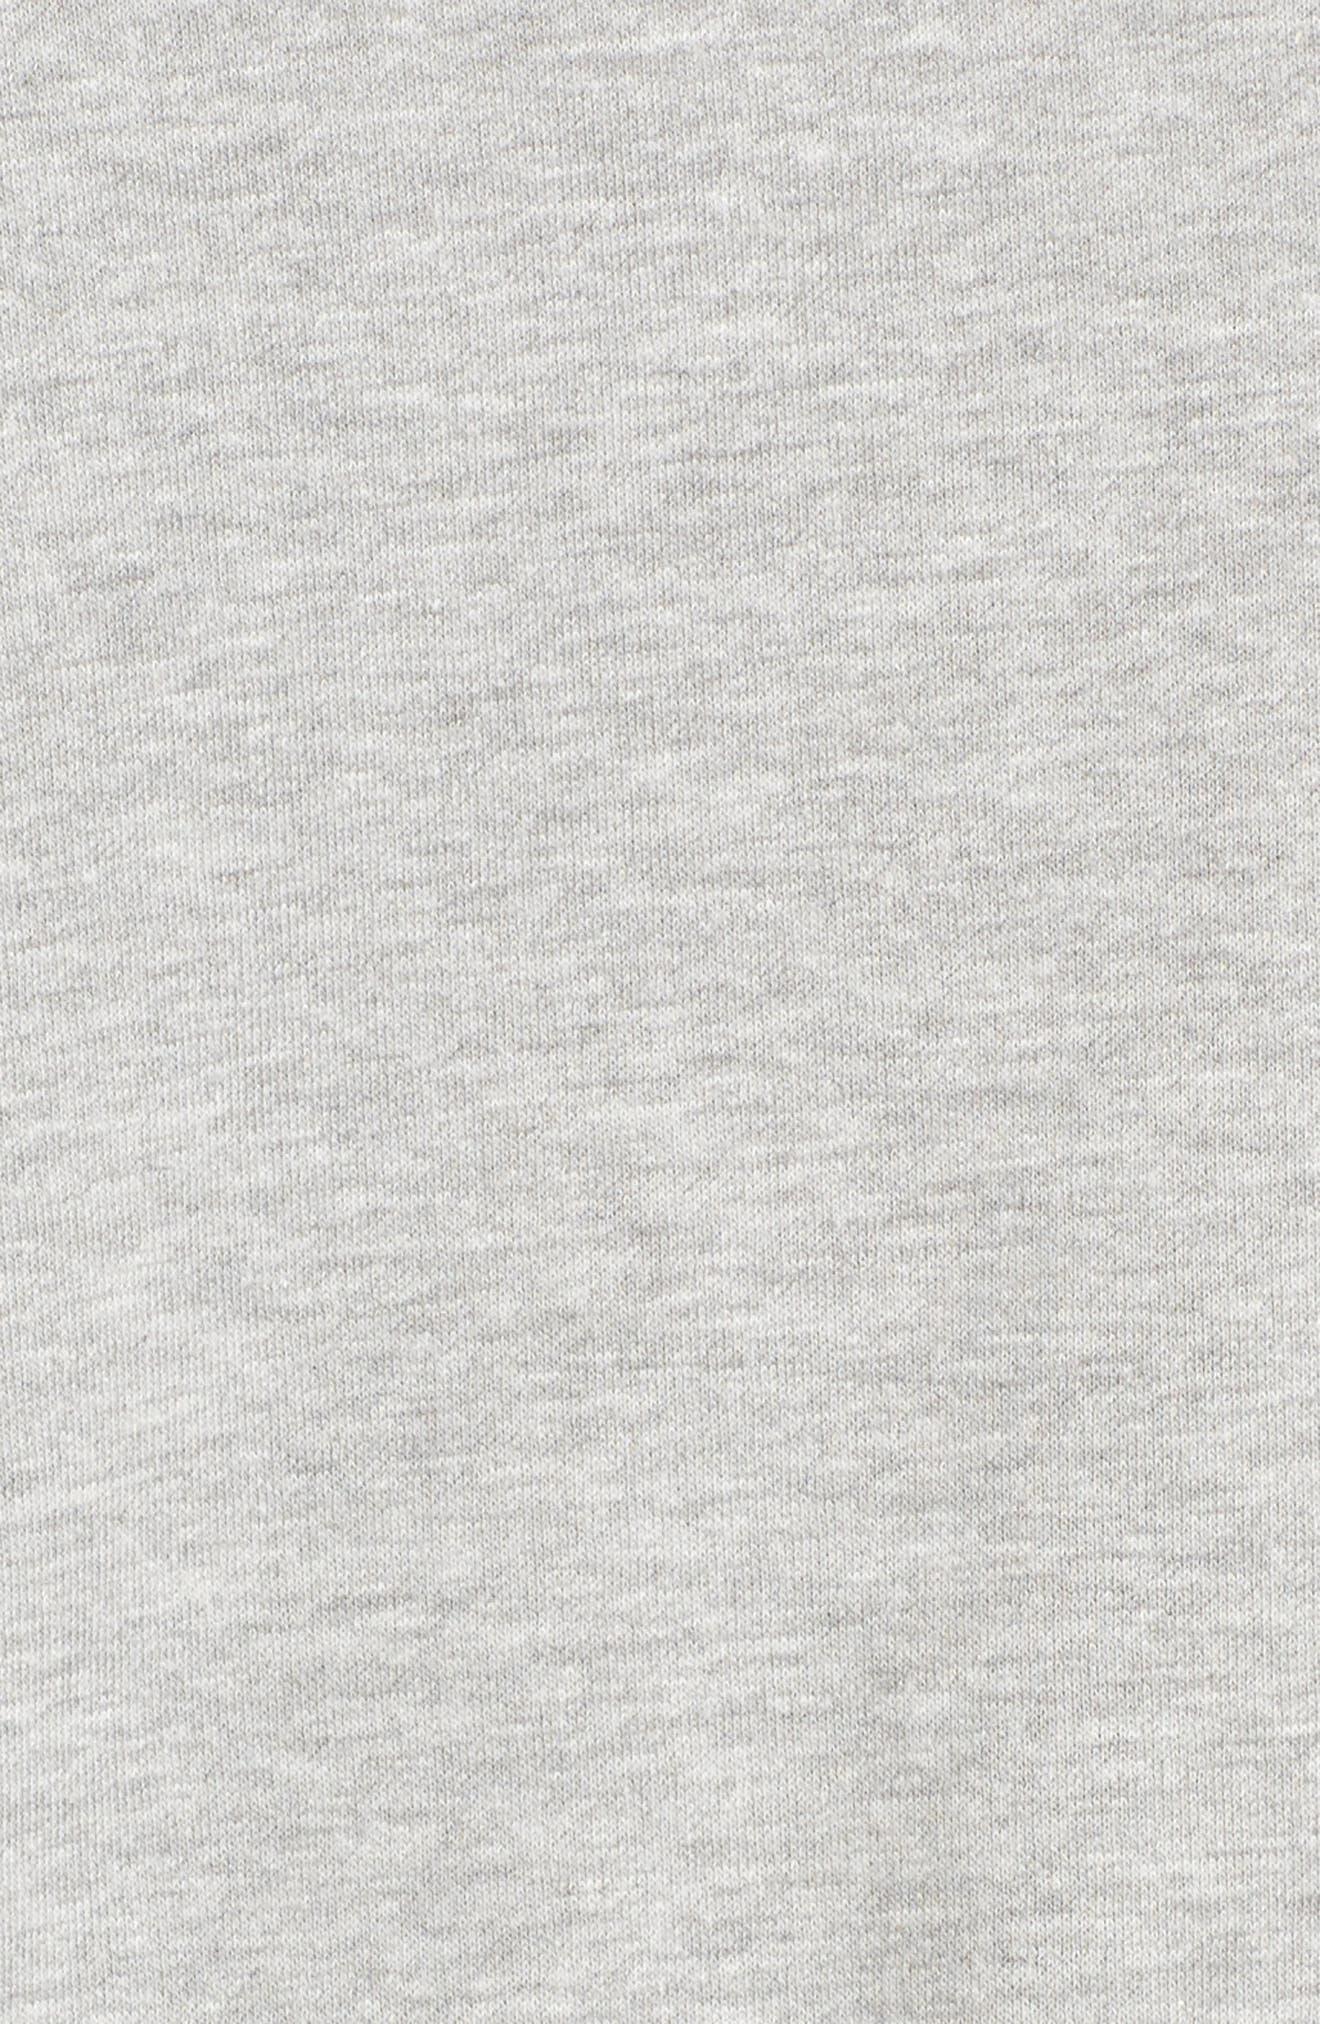 Blouson Sleeve Sweatshirt,                             Alternate thumbnail 22, color,